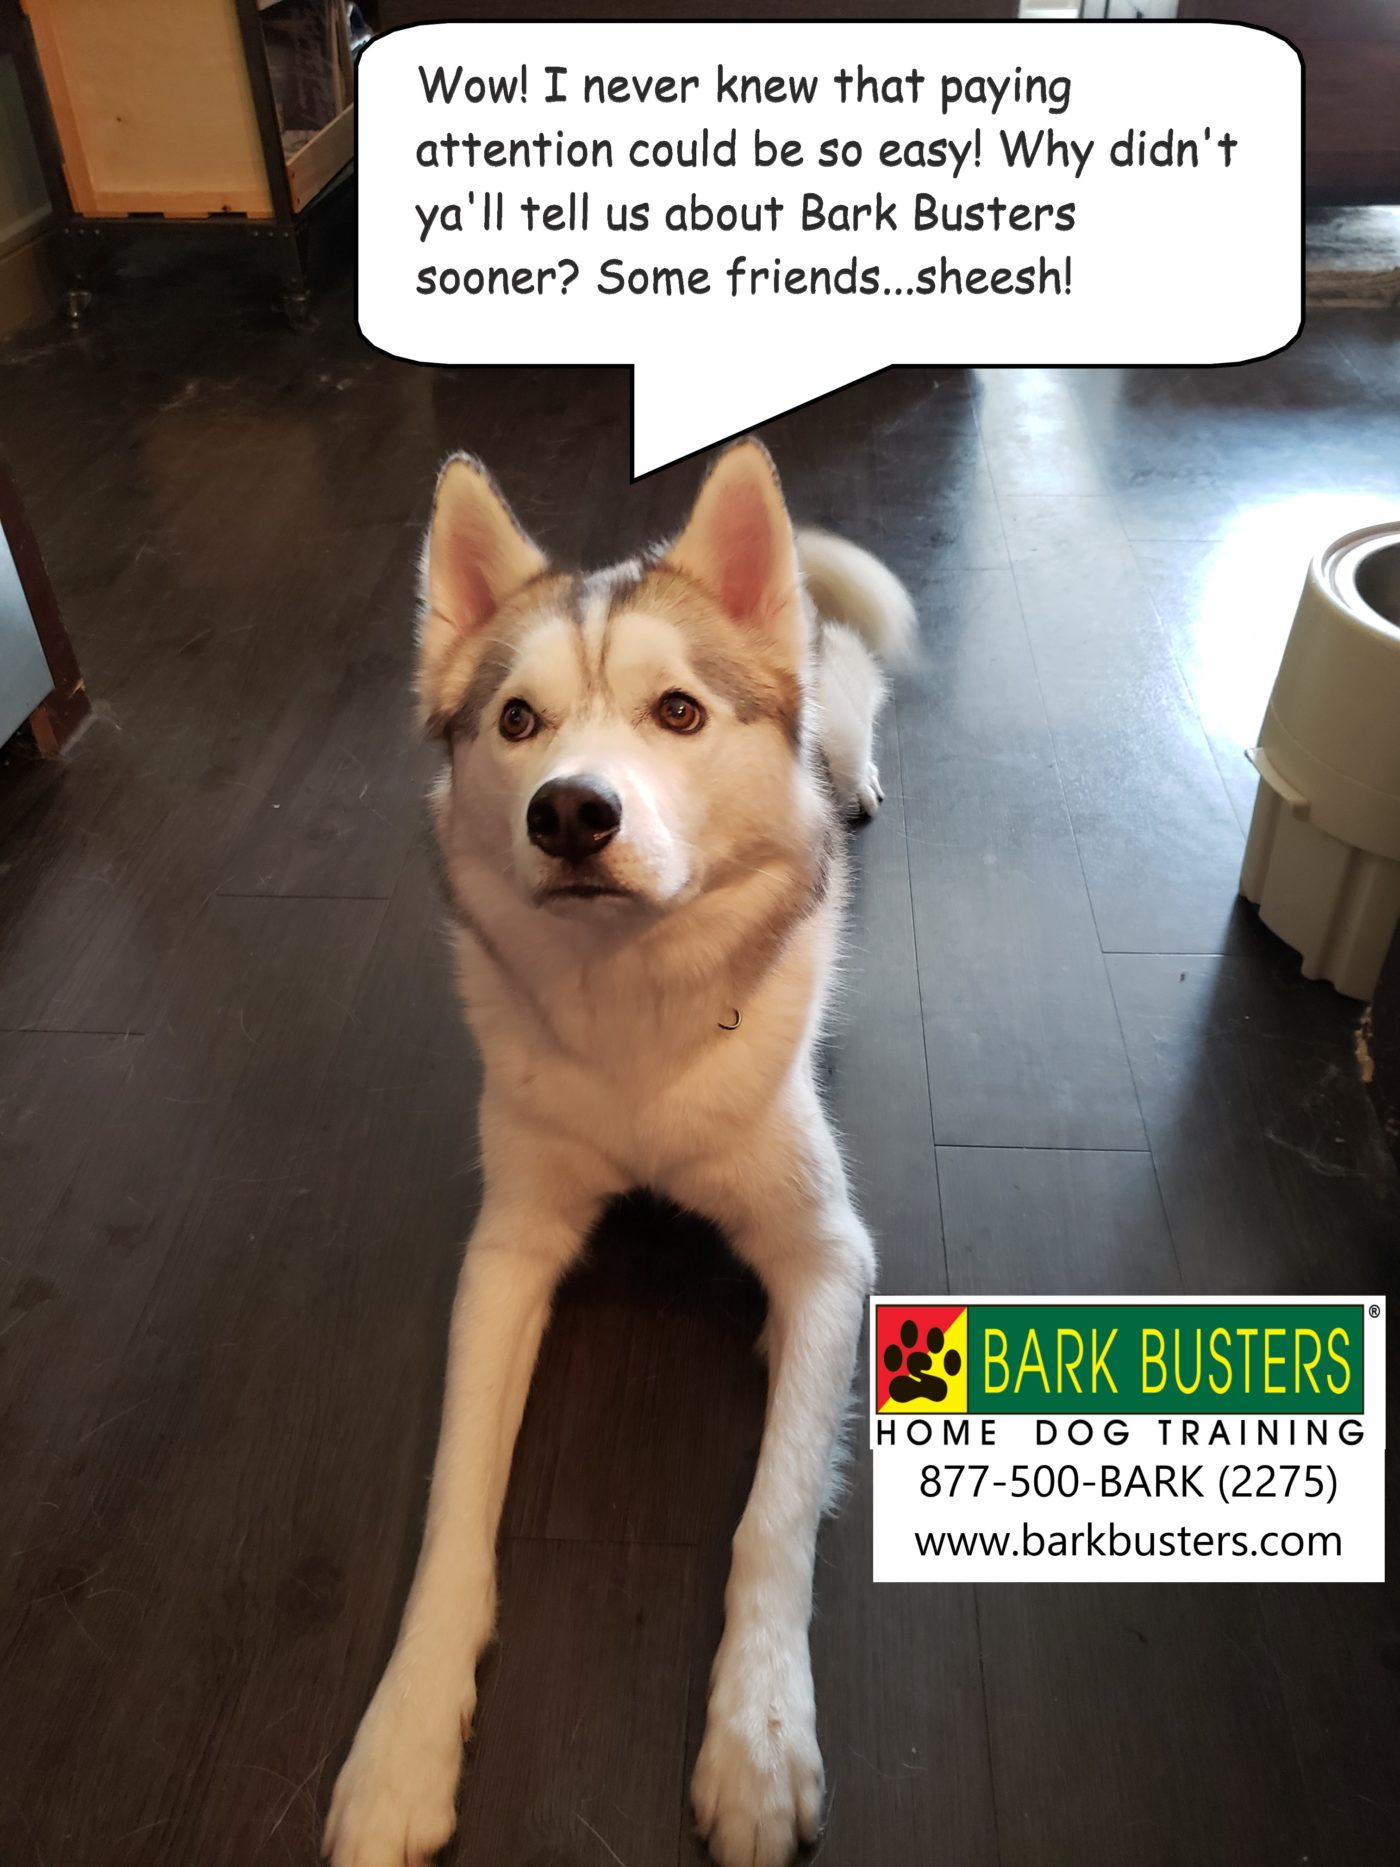 #huskydogtraining #bestdogtrainingeastaustin #dogsofbarkbusters #dogtrainerroundrock